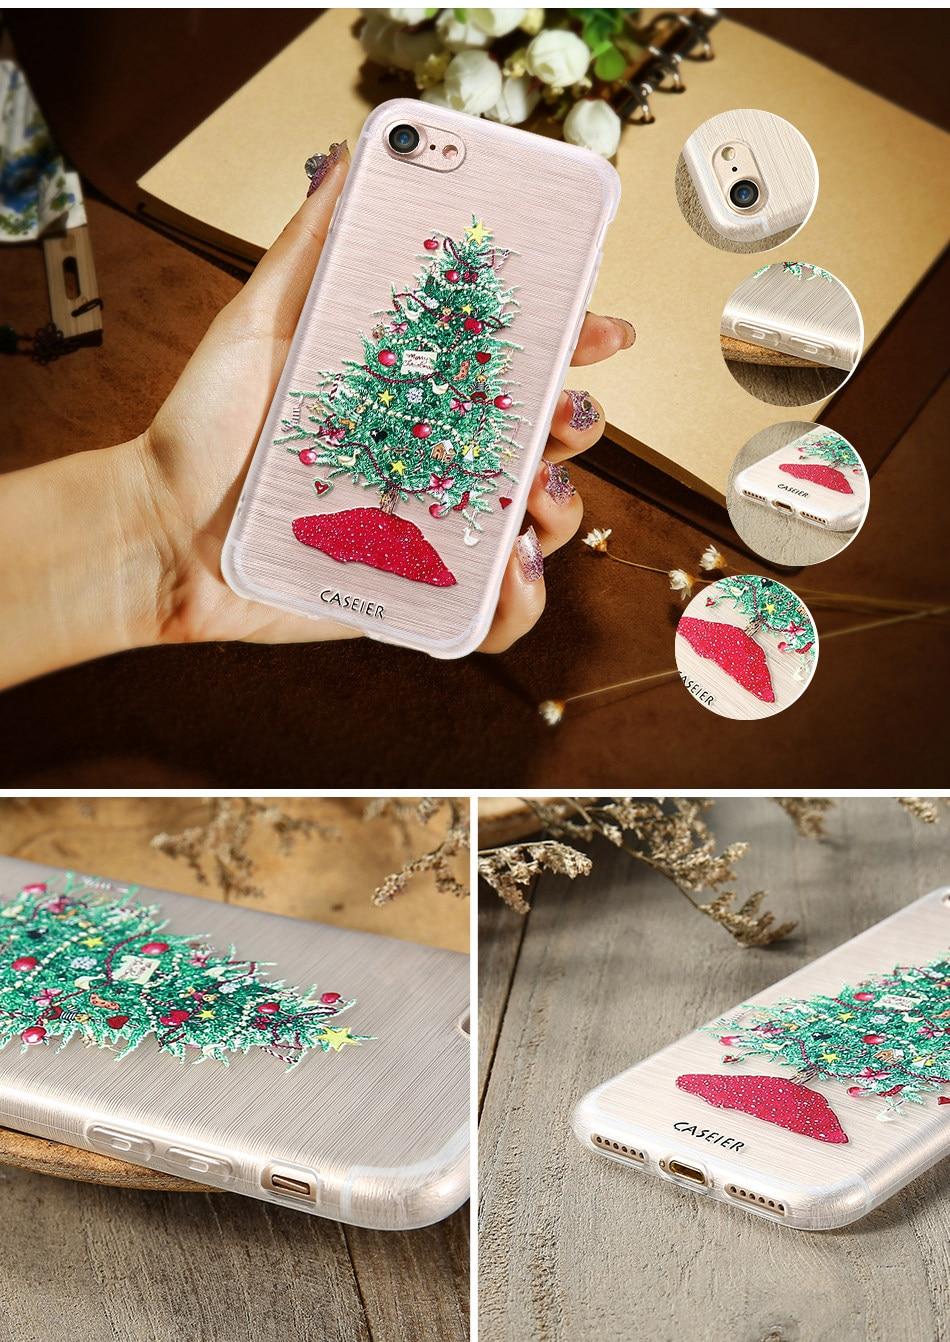 HTB1KOkgOpXXXXamXpXXq6xXFXXXV - Christmas Phone Case For iPhone 7 6 6S Plus iPhone 5S SE 5 Cases For Samsung Galaxy S6 S7 Edge Cute Cover Accessories PTC 286